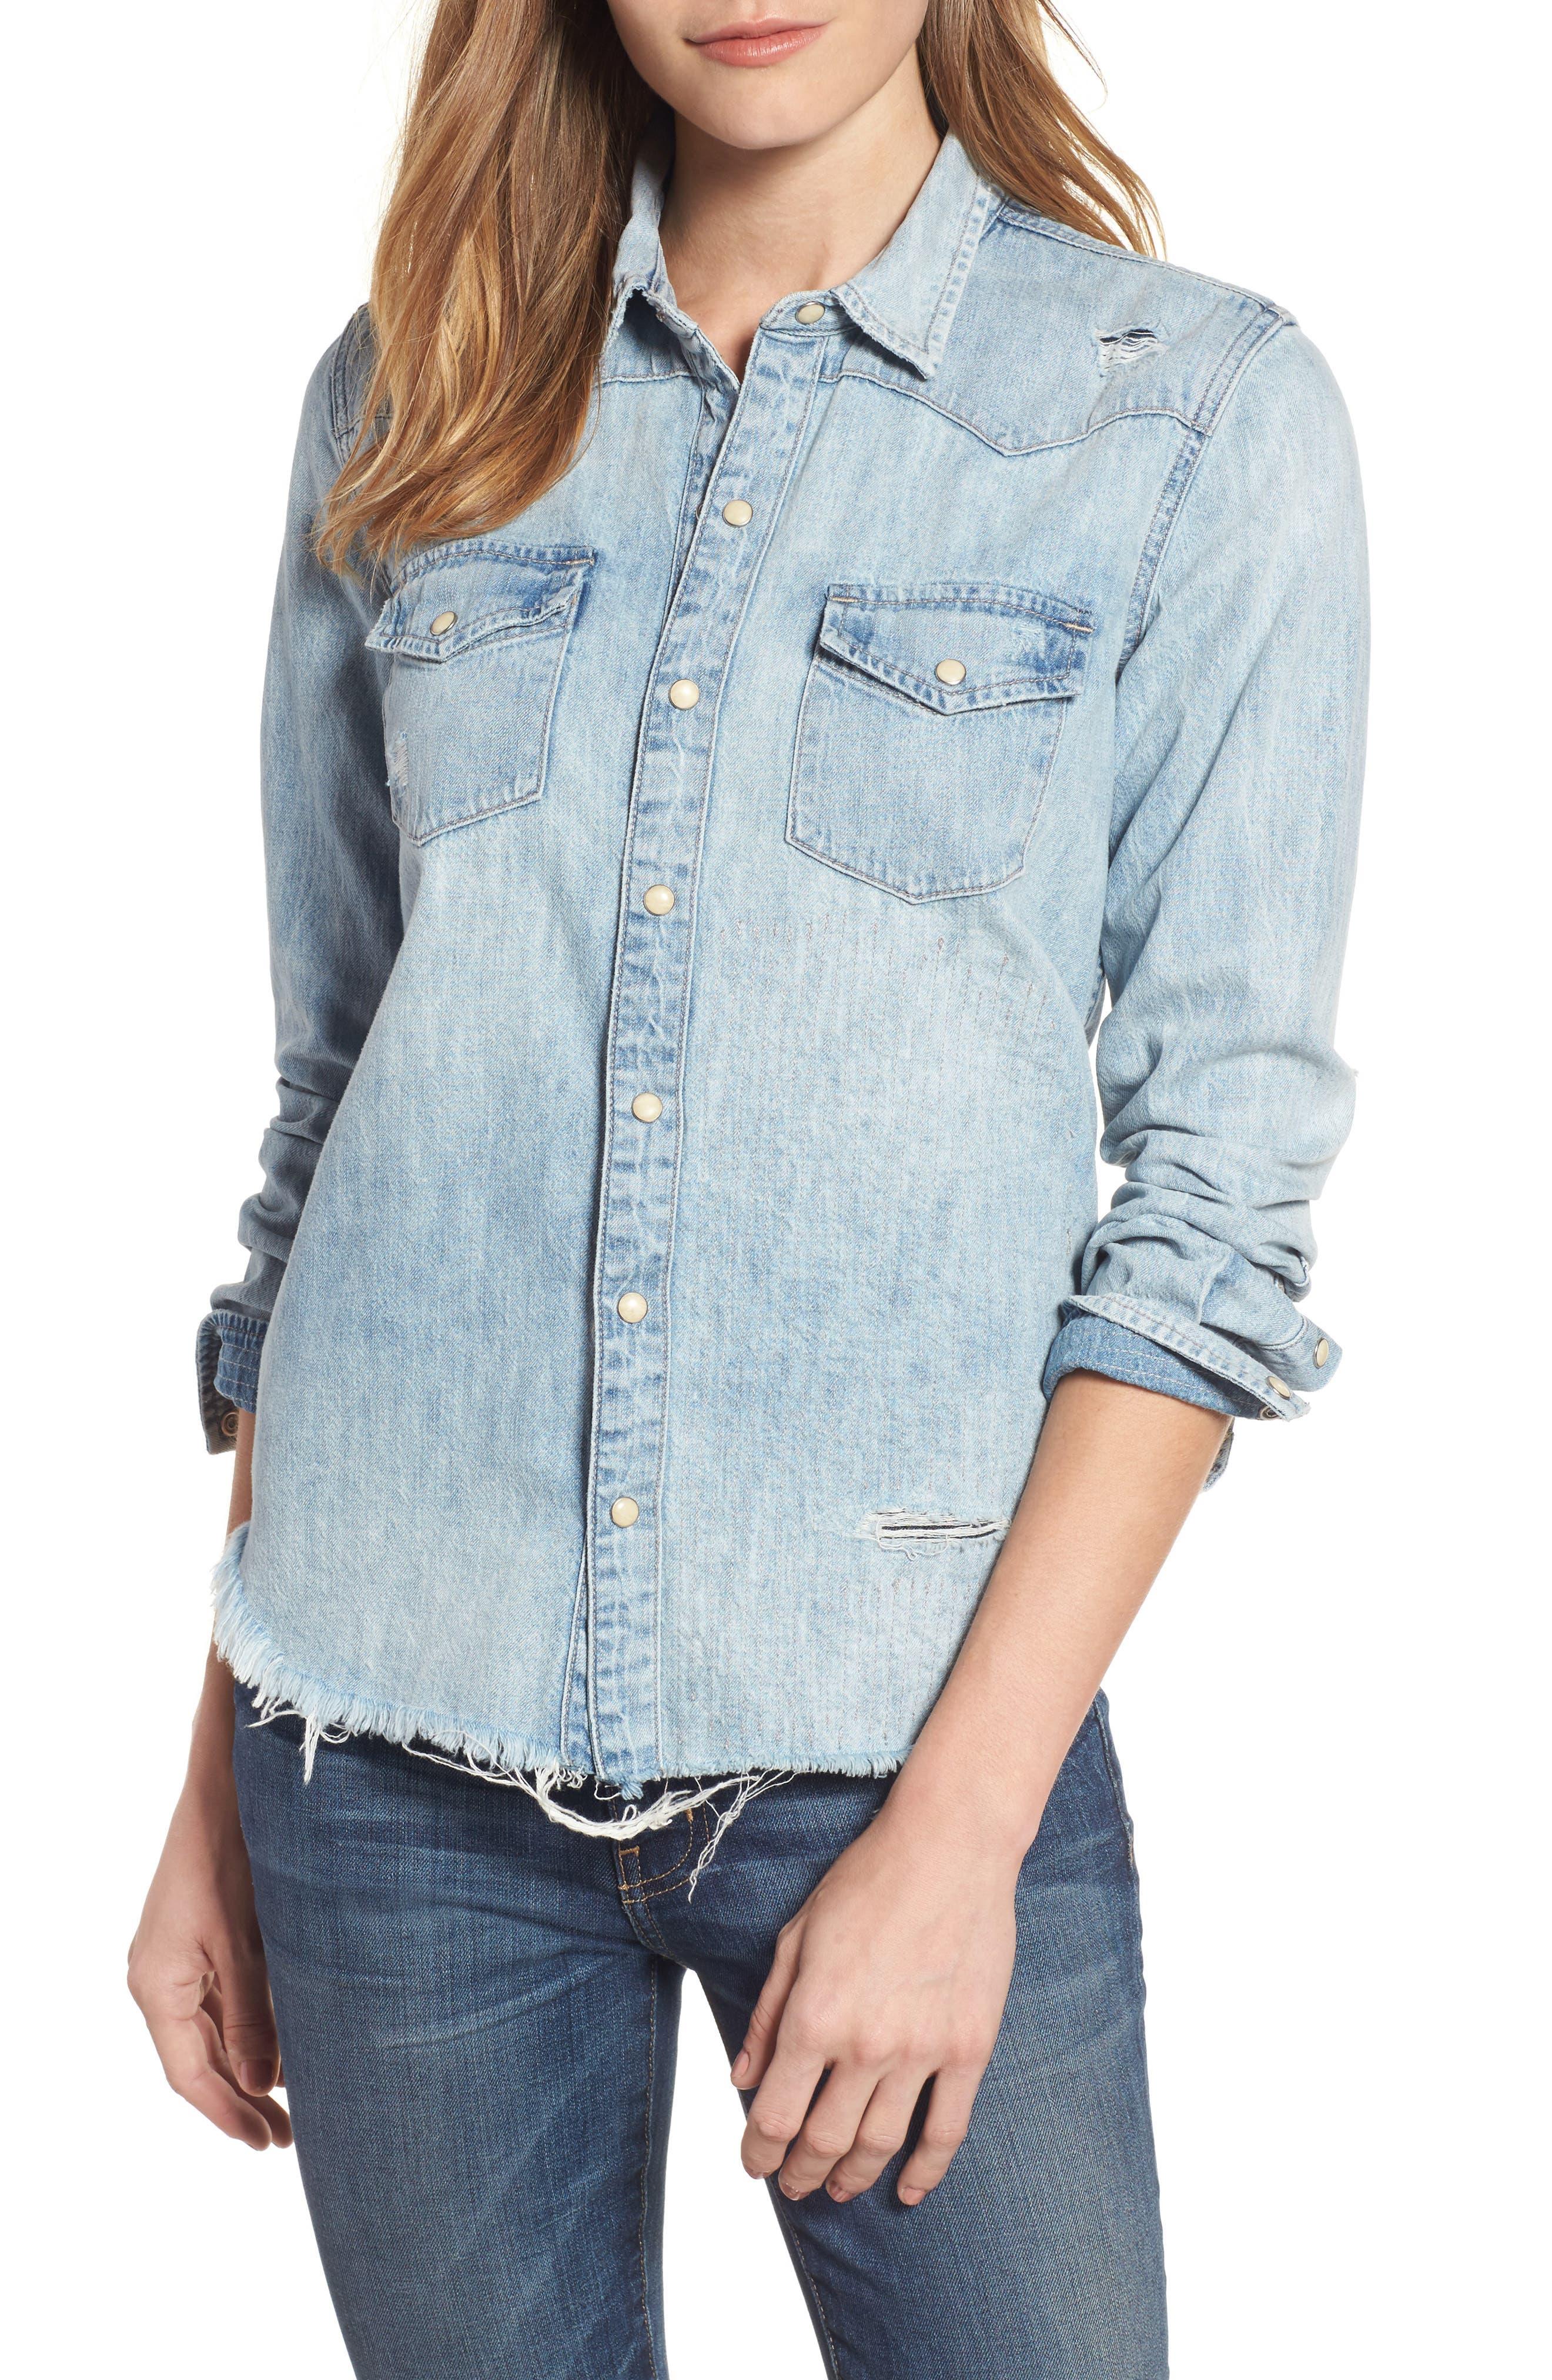 Alternate Image 1 Selected - Lucky Brand Studded Denim Western Shirt